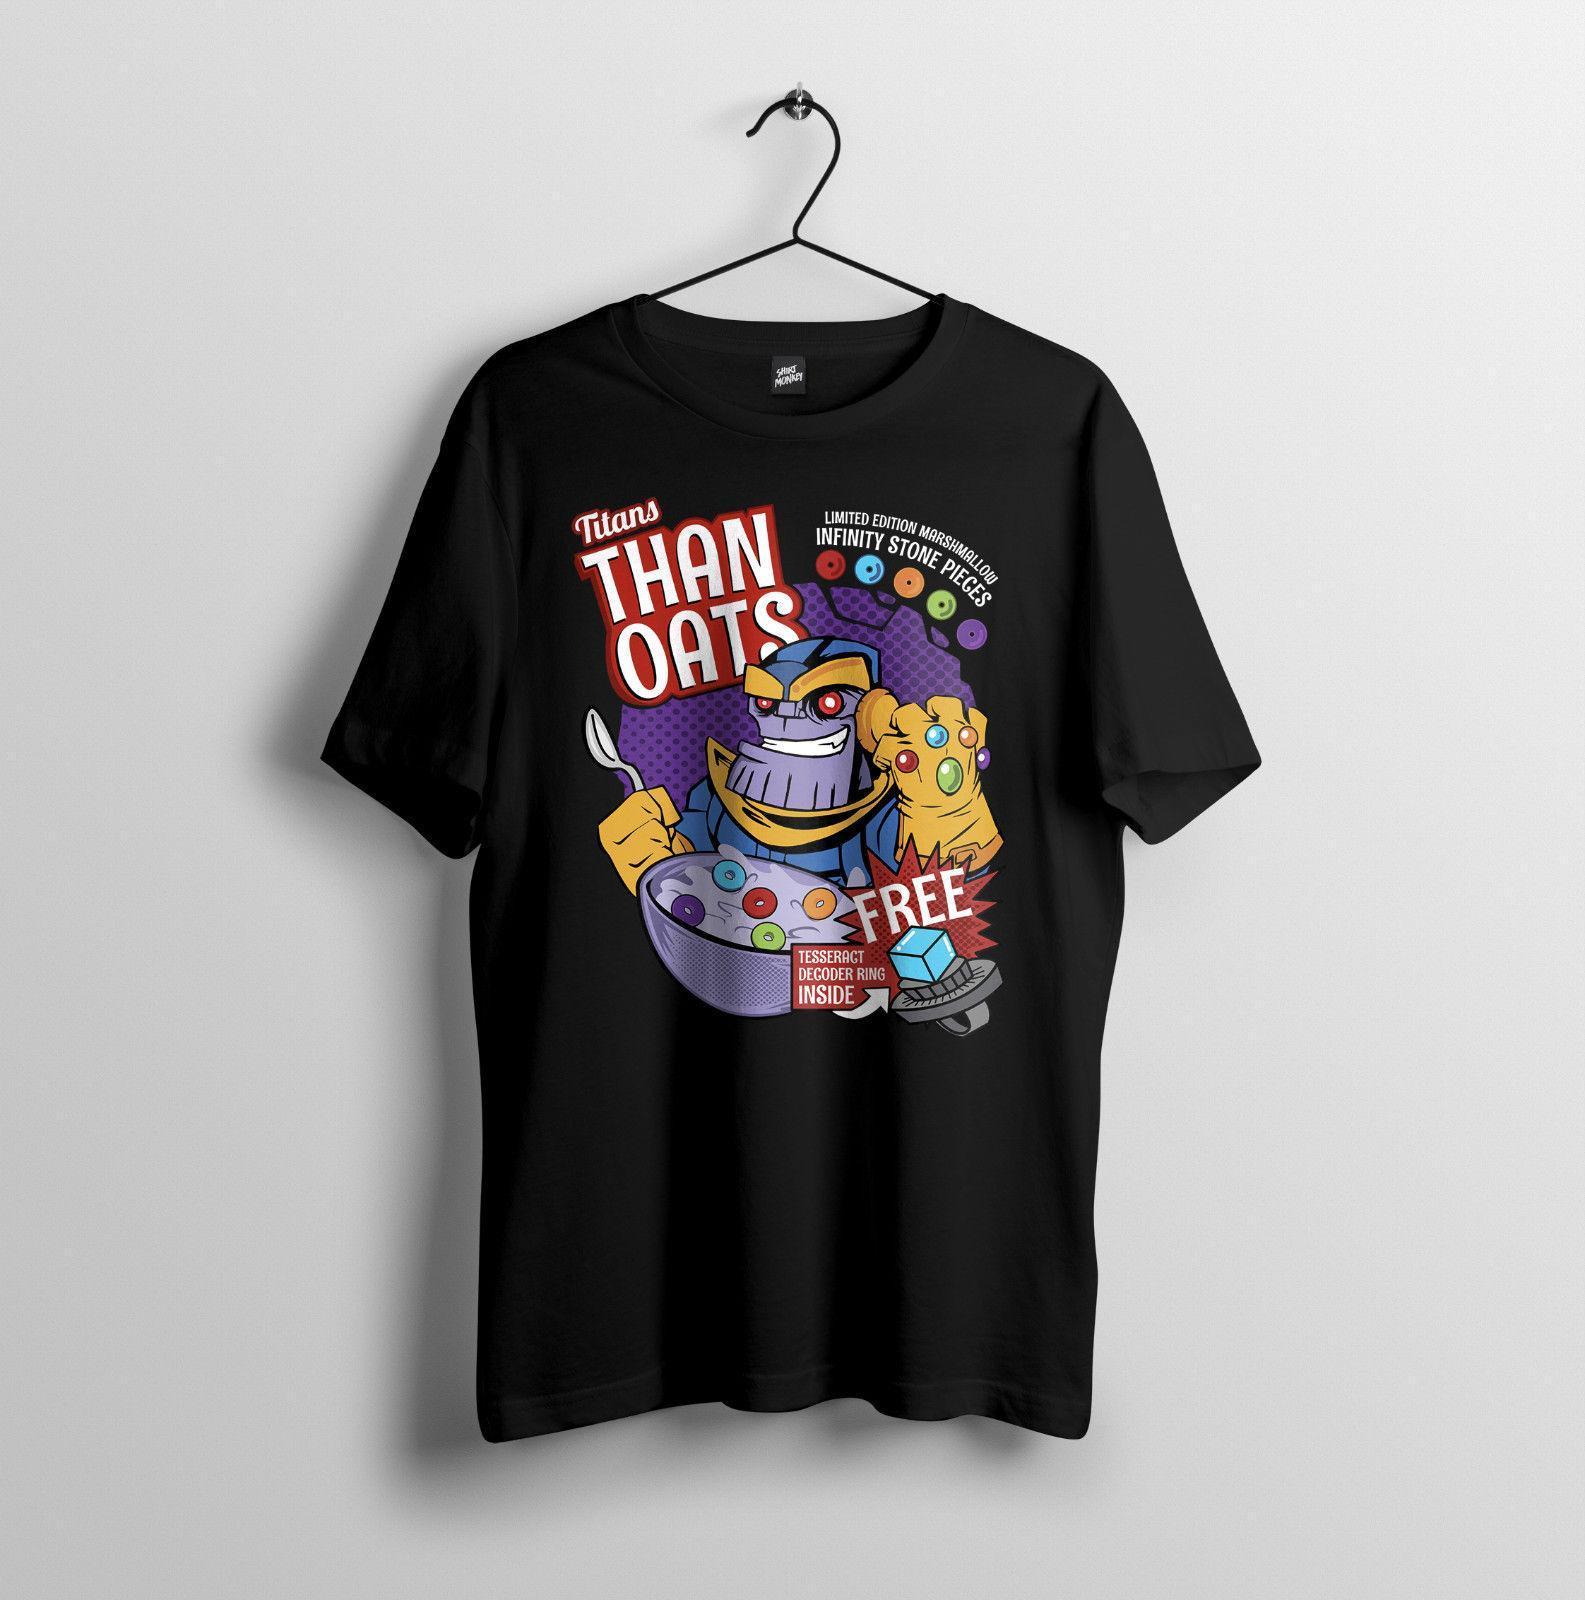 f0f27dcc7 Than Oats Avengers Infinity War, Marvel, Parody Mens Unisex T Shirt S 2XL  Shirt Design Tees From Jie037, $14.67| DHgate.Com